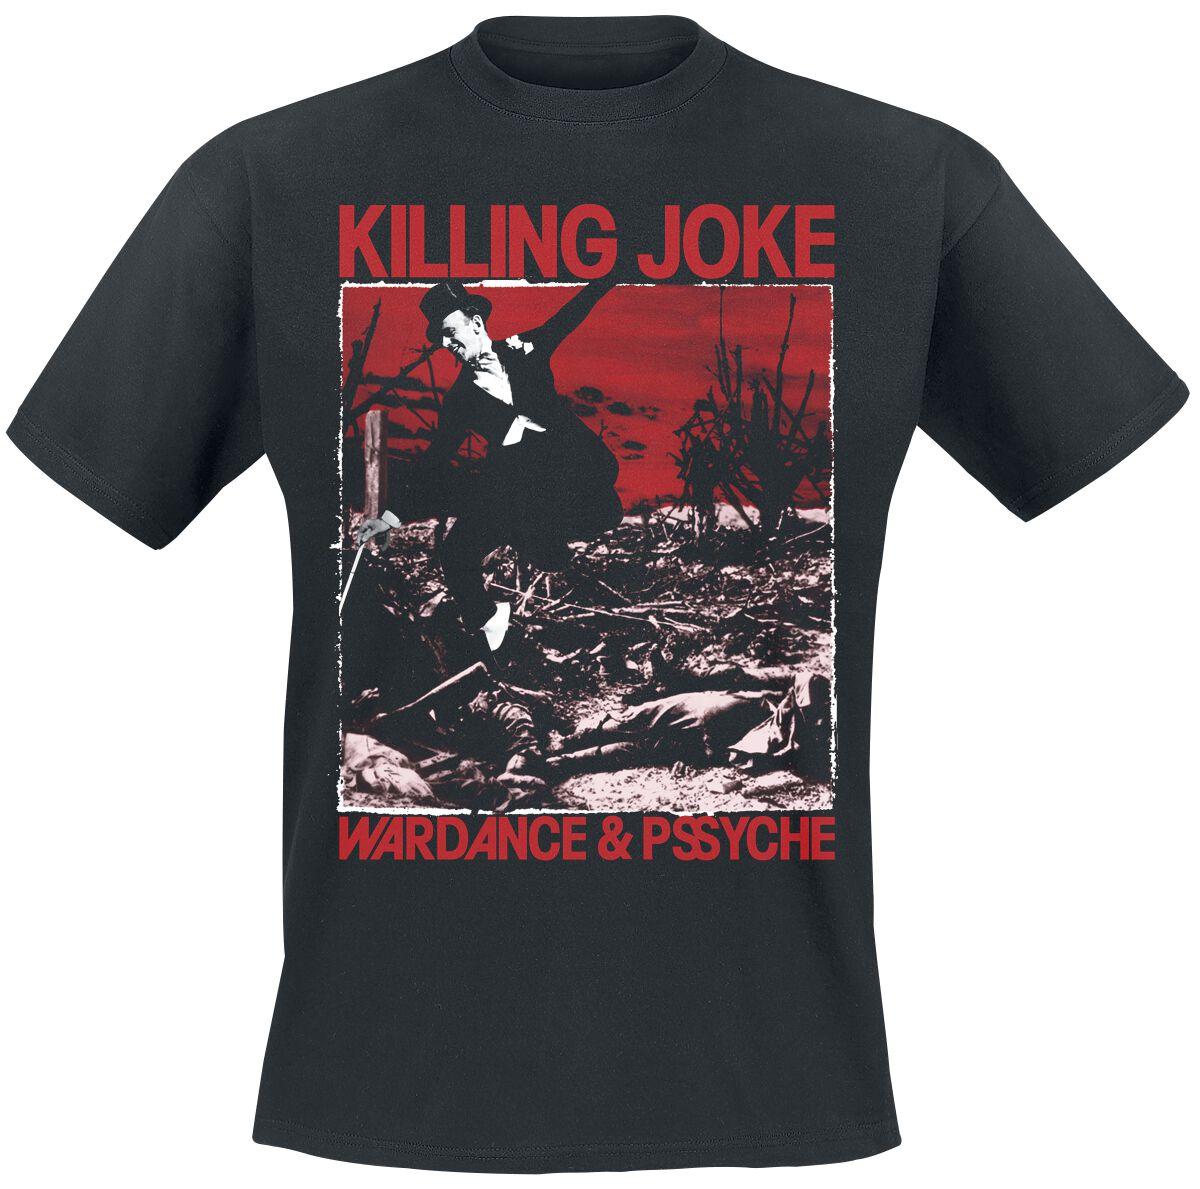 Killing Joke Wardance & Pssyche  T-Shirt  schwarz